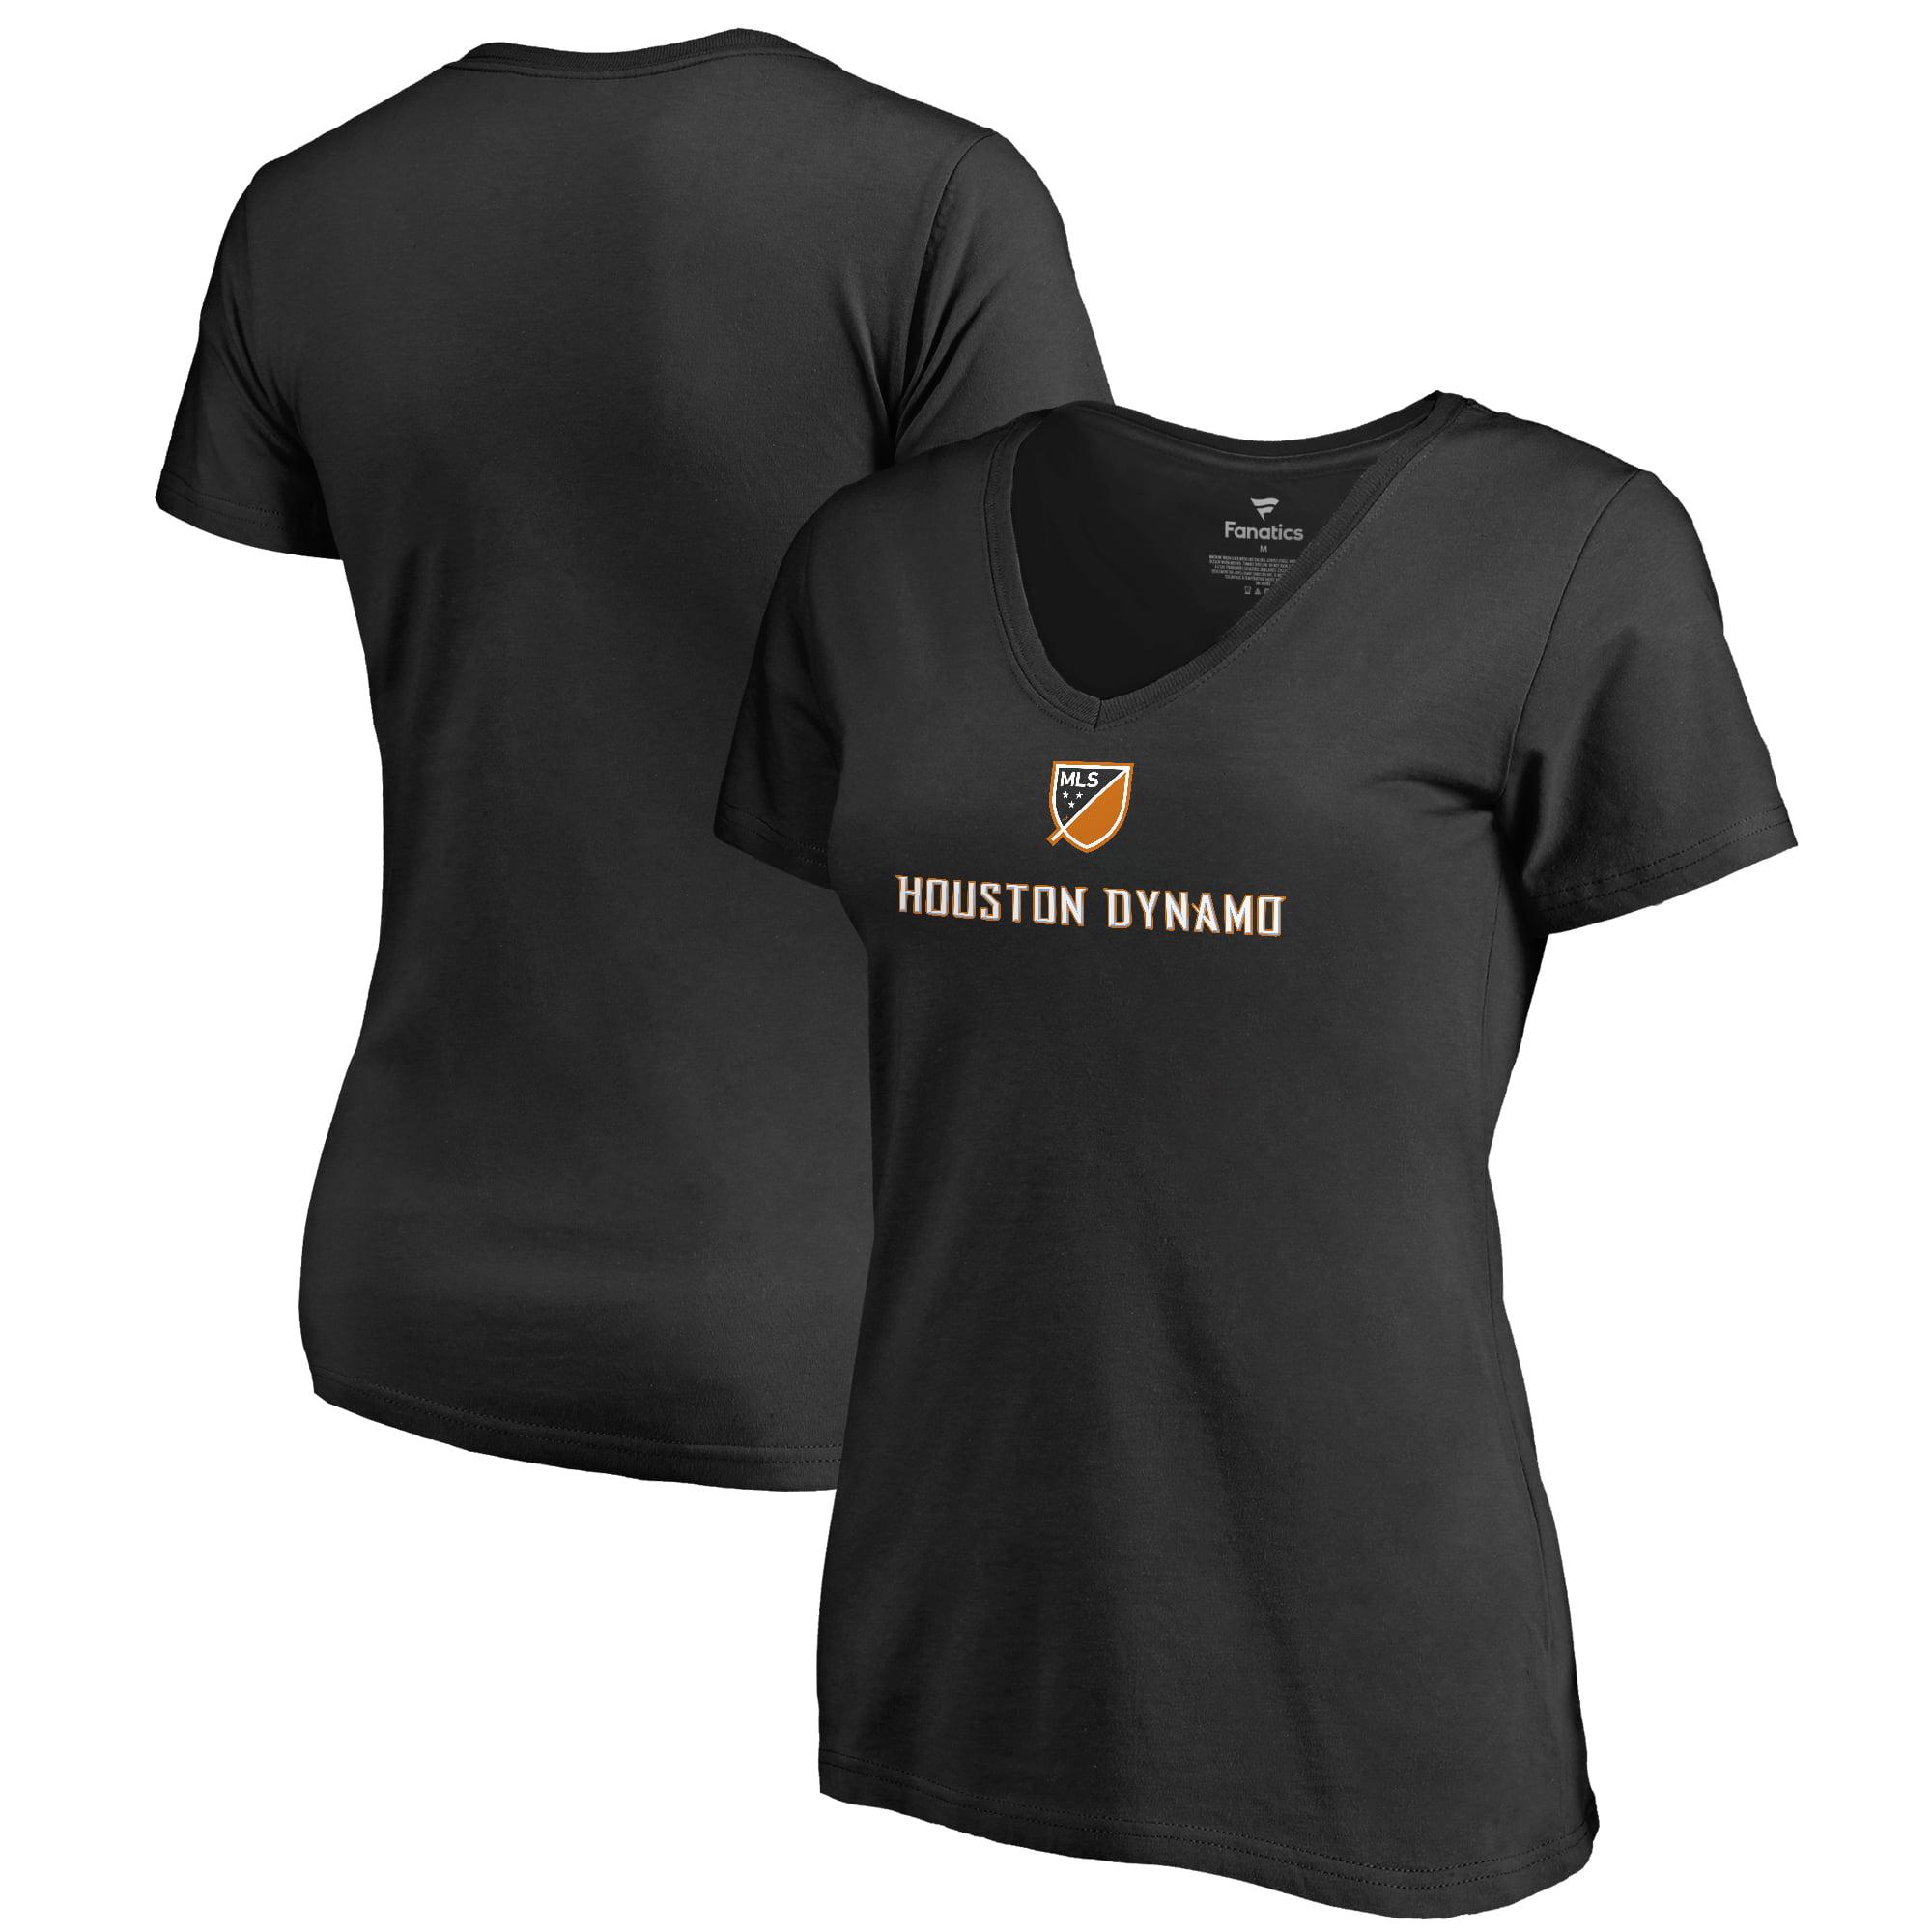 Houston Dynamo Fanatics Branded Women's Shielded V-Neck T-Shirt - Black